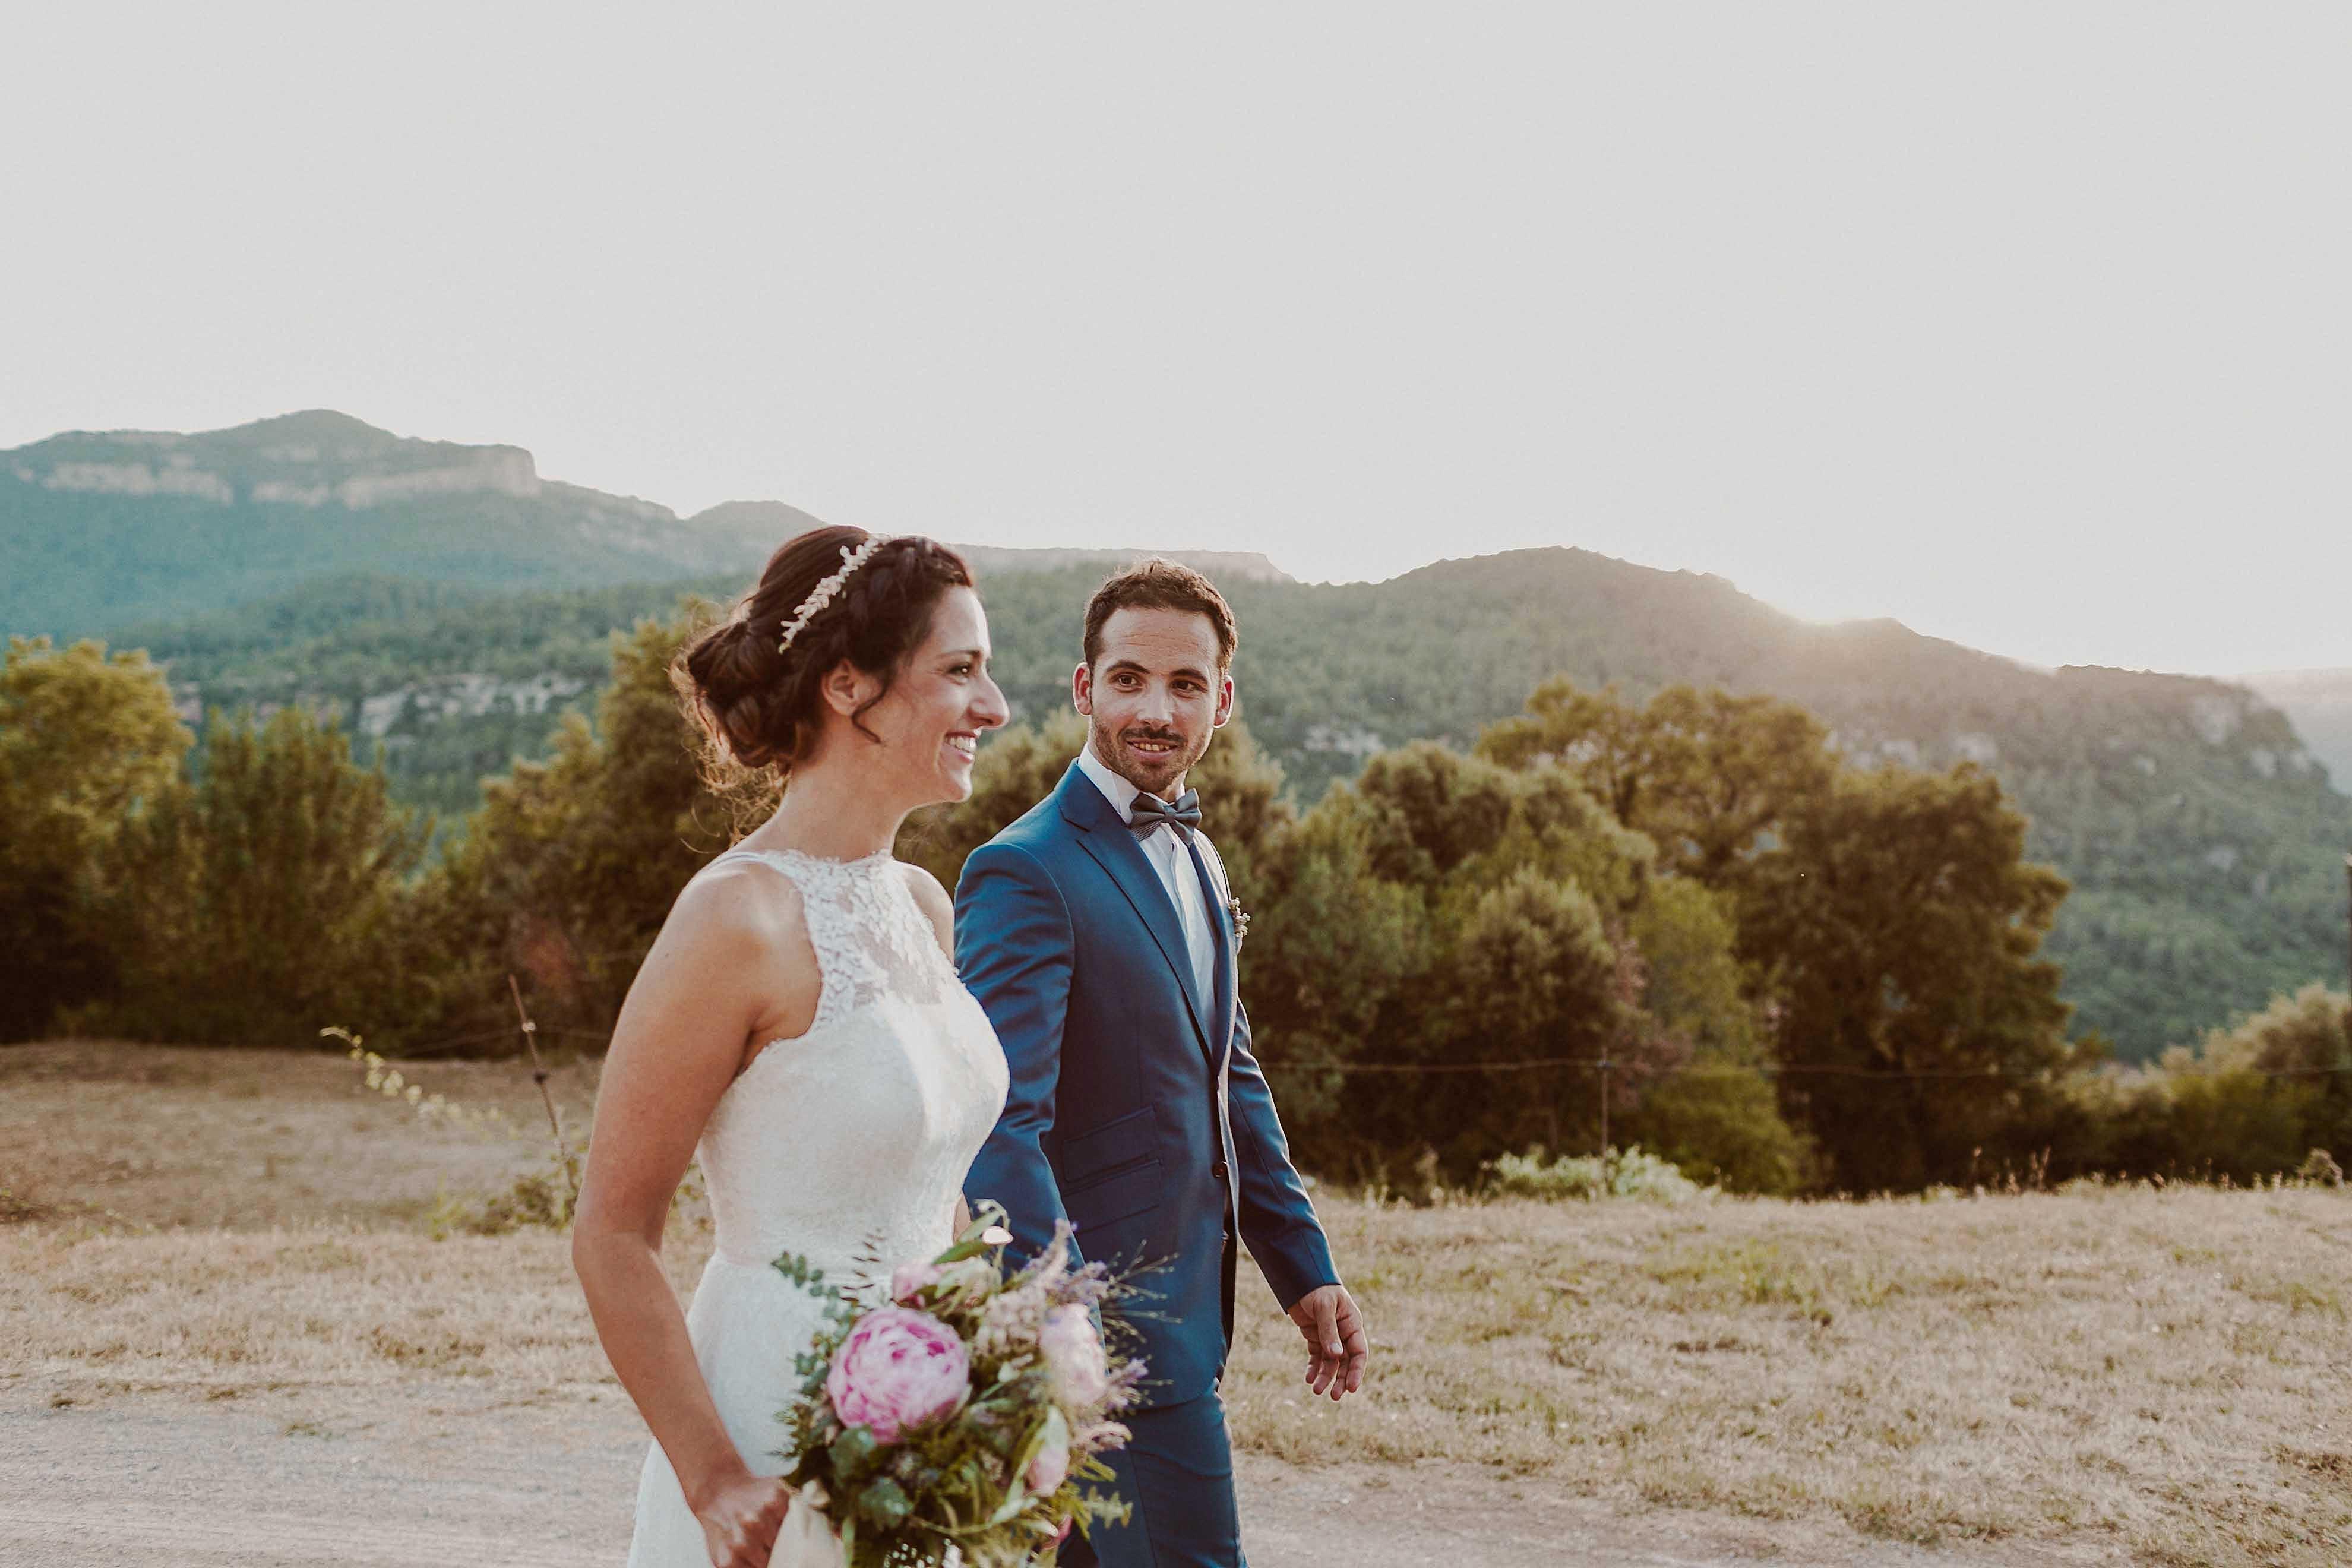 Boda rústica en la montaña. fotgrafo de bodas barcelona_071